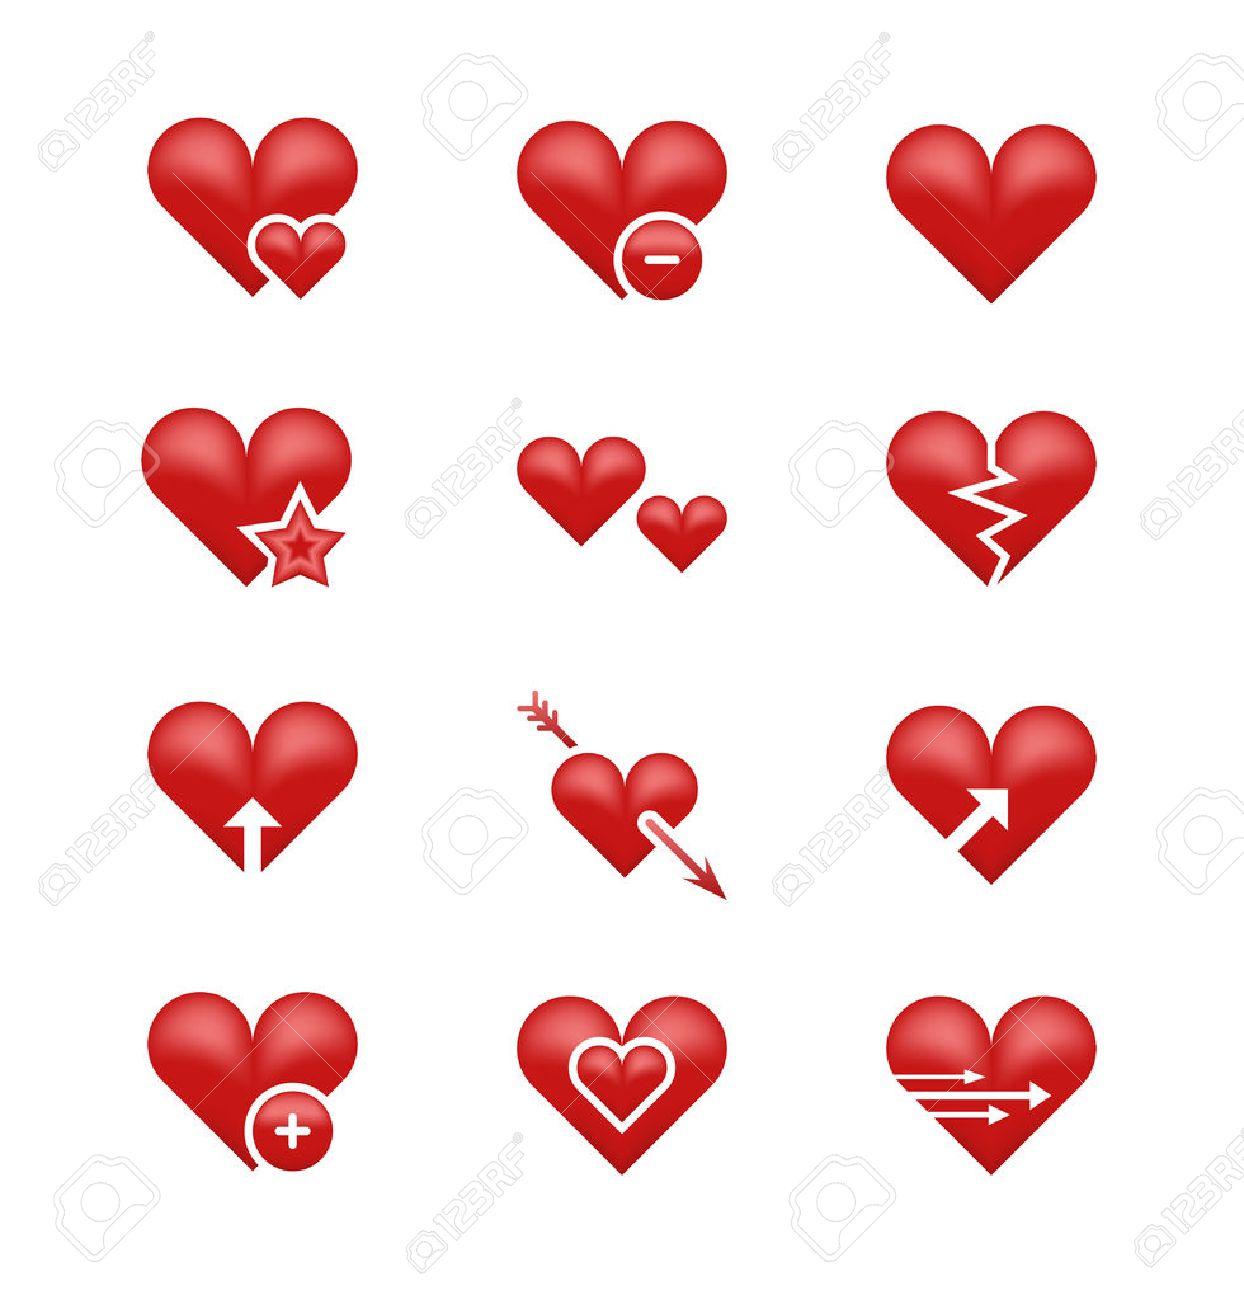 Heart Love Emoji Emoticons Vector Set Broken Heart Arrow And